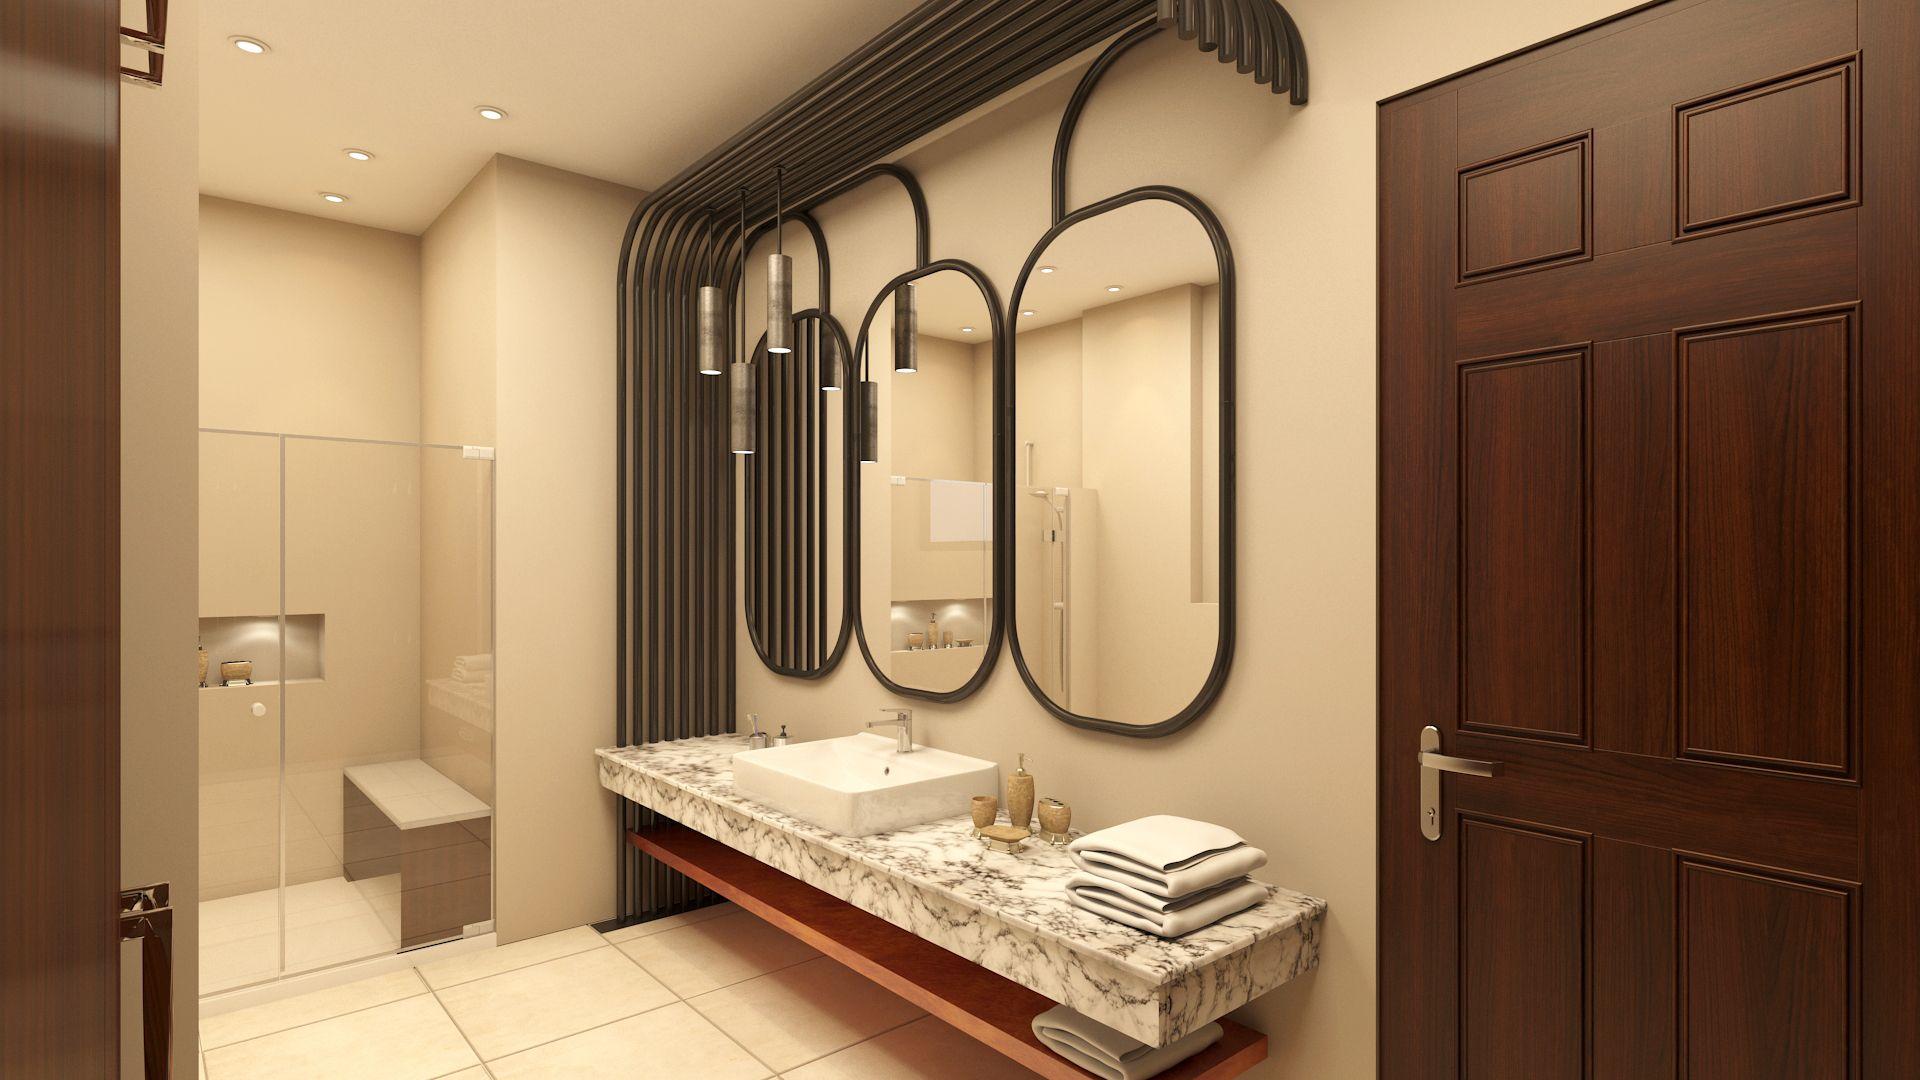 Pin By Warraich Fatima On Pdf Books Download Bathroom Interior Design Bathroom Design Bathroom Interior Bathroom design ideas pakistan